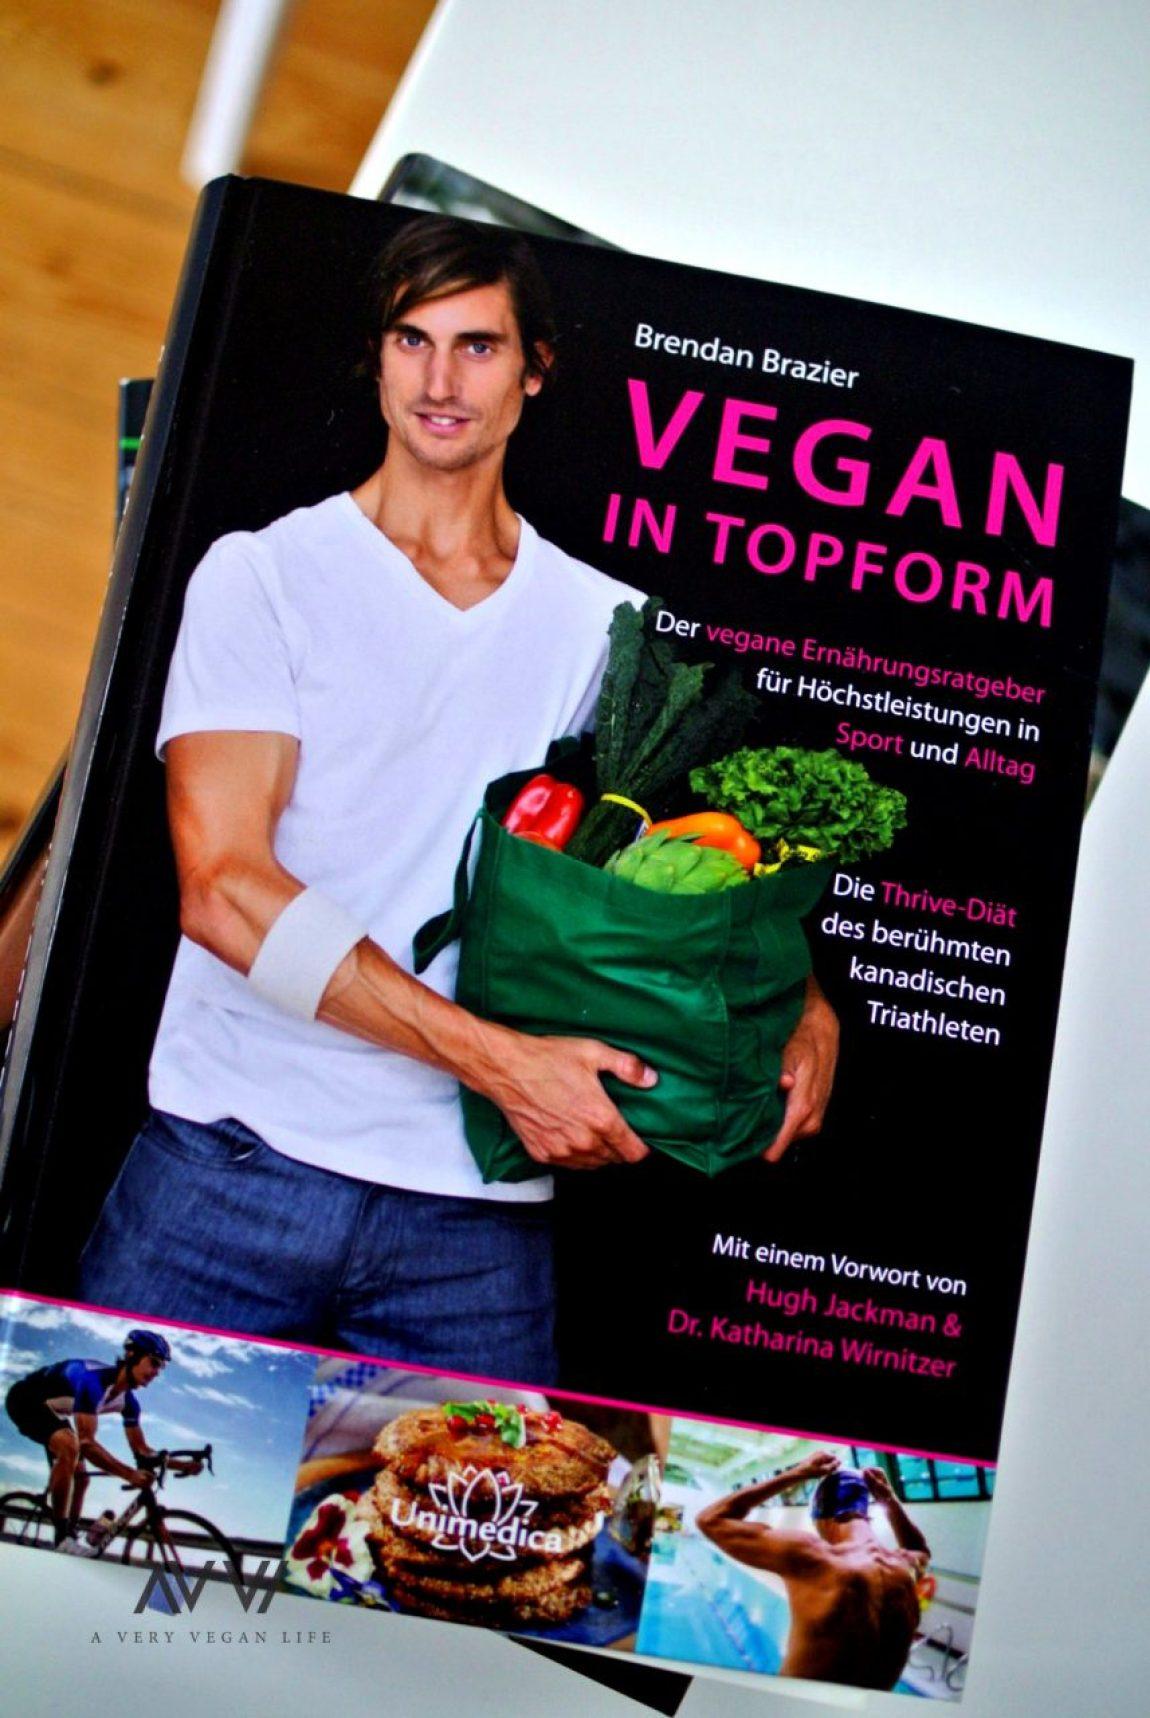 Brazier-Vegan-in-Topform-Kochbuch-1